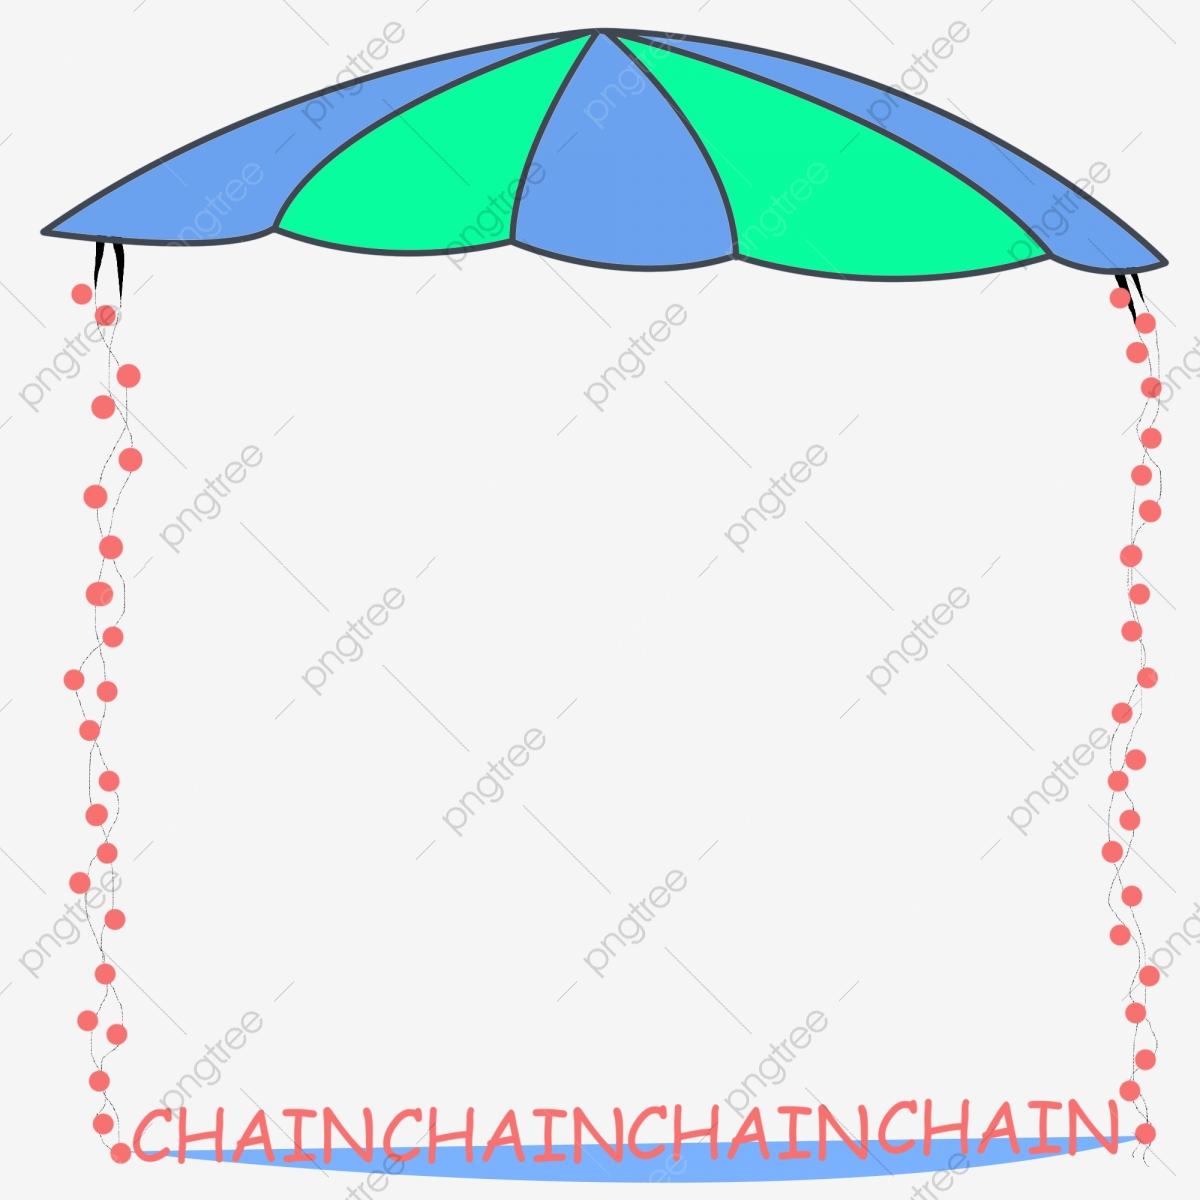 Clipart umbrella border. Creative illustration blue